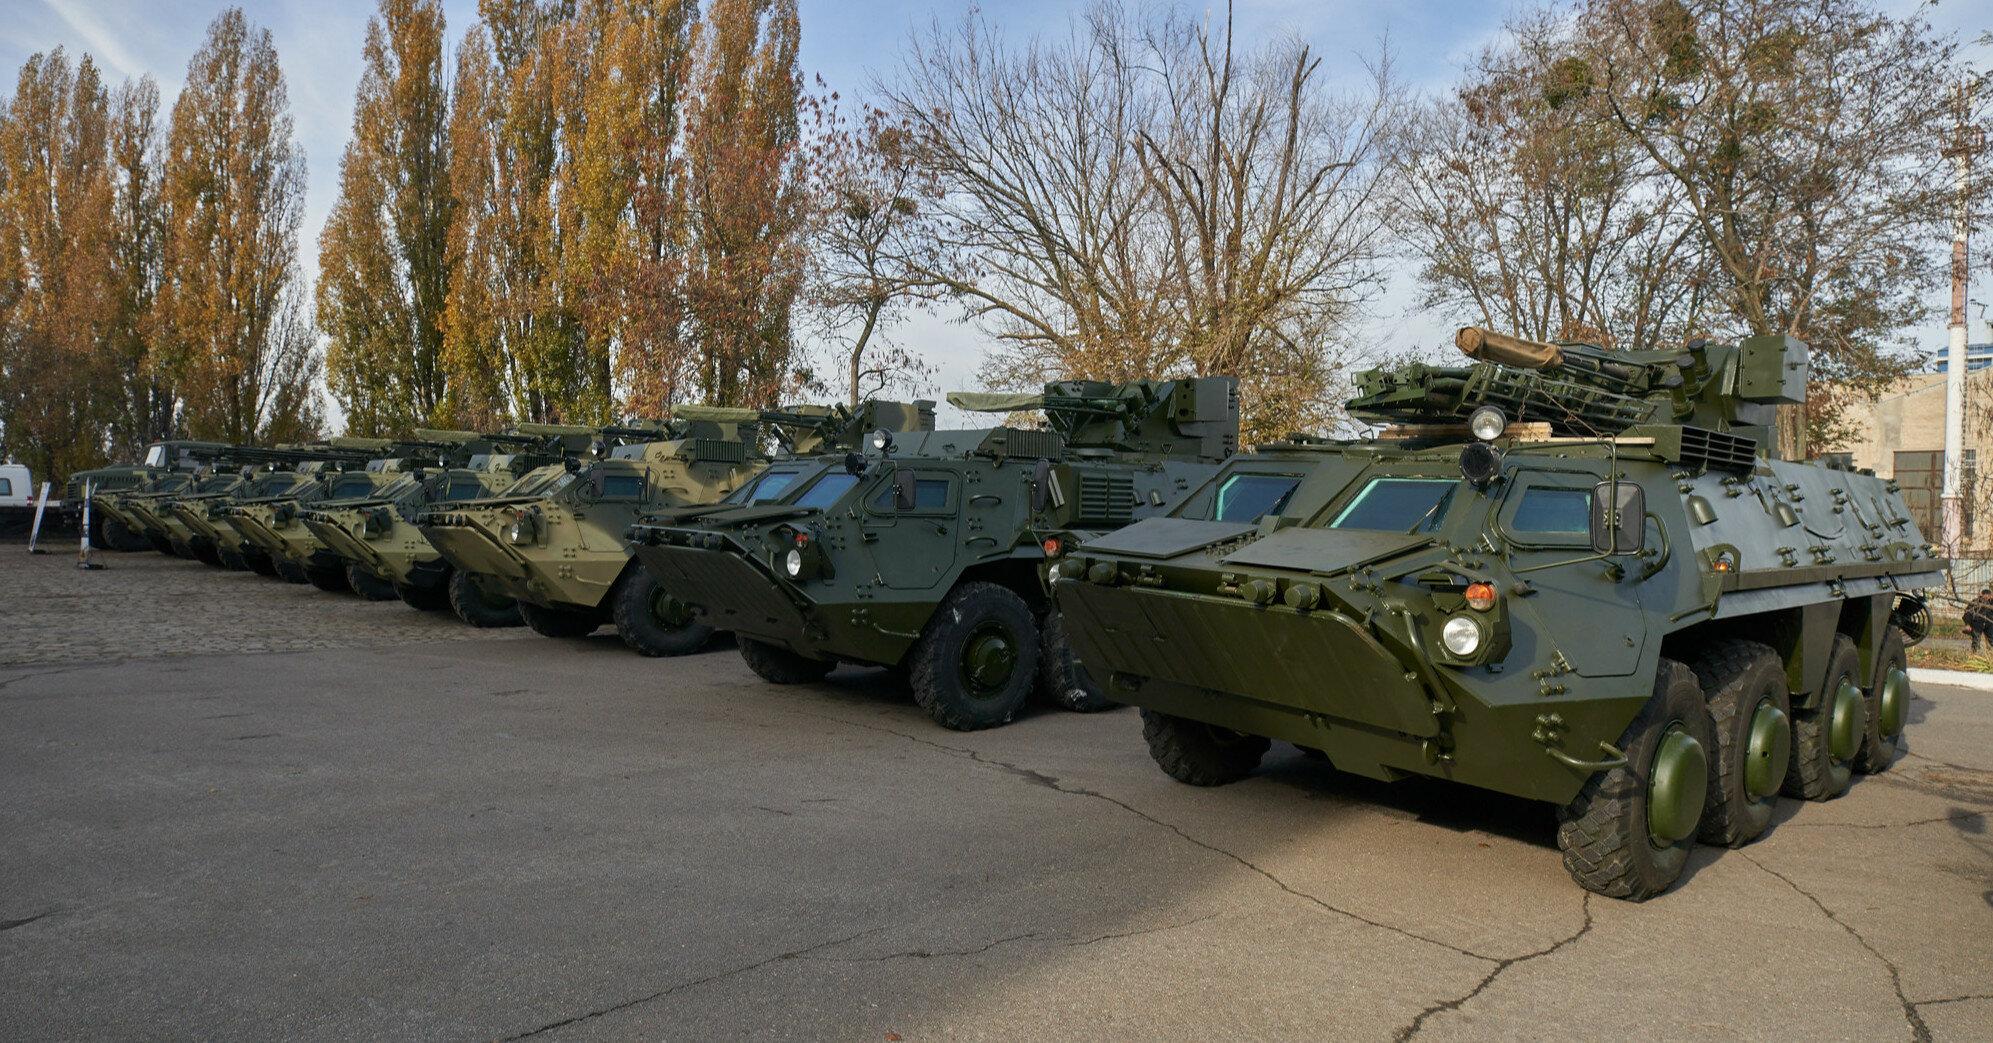 РФ провела учения танкистов в Крыму на фоне маневров НАТО